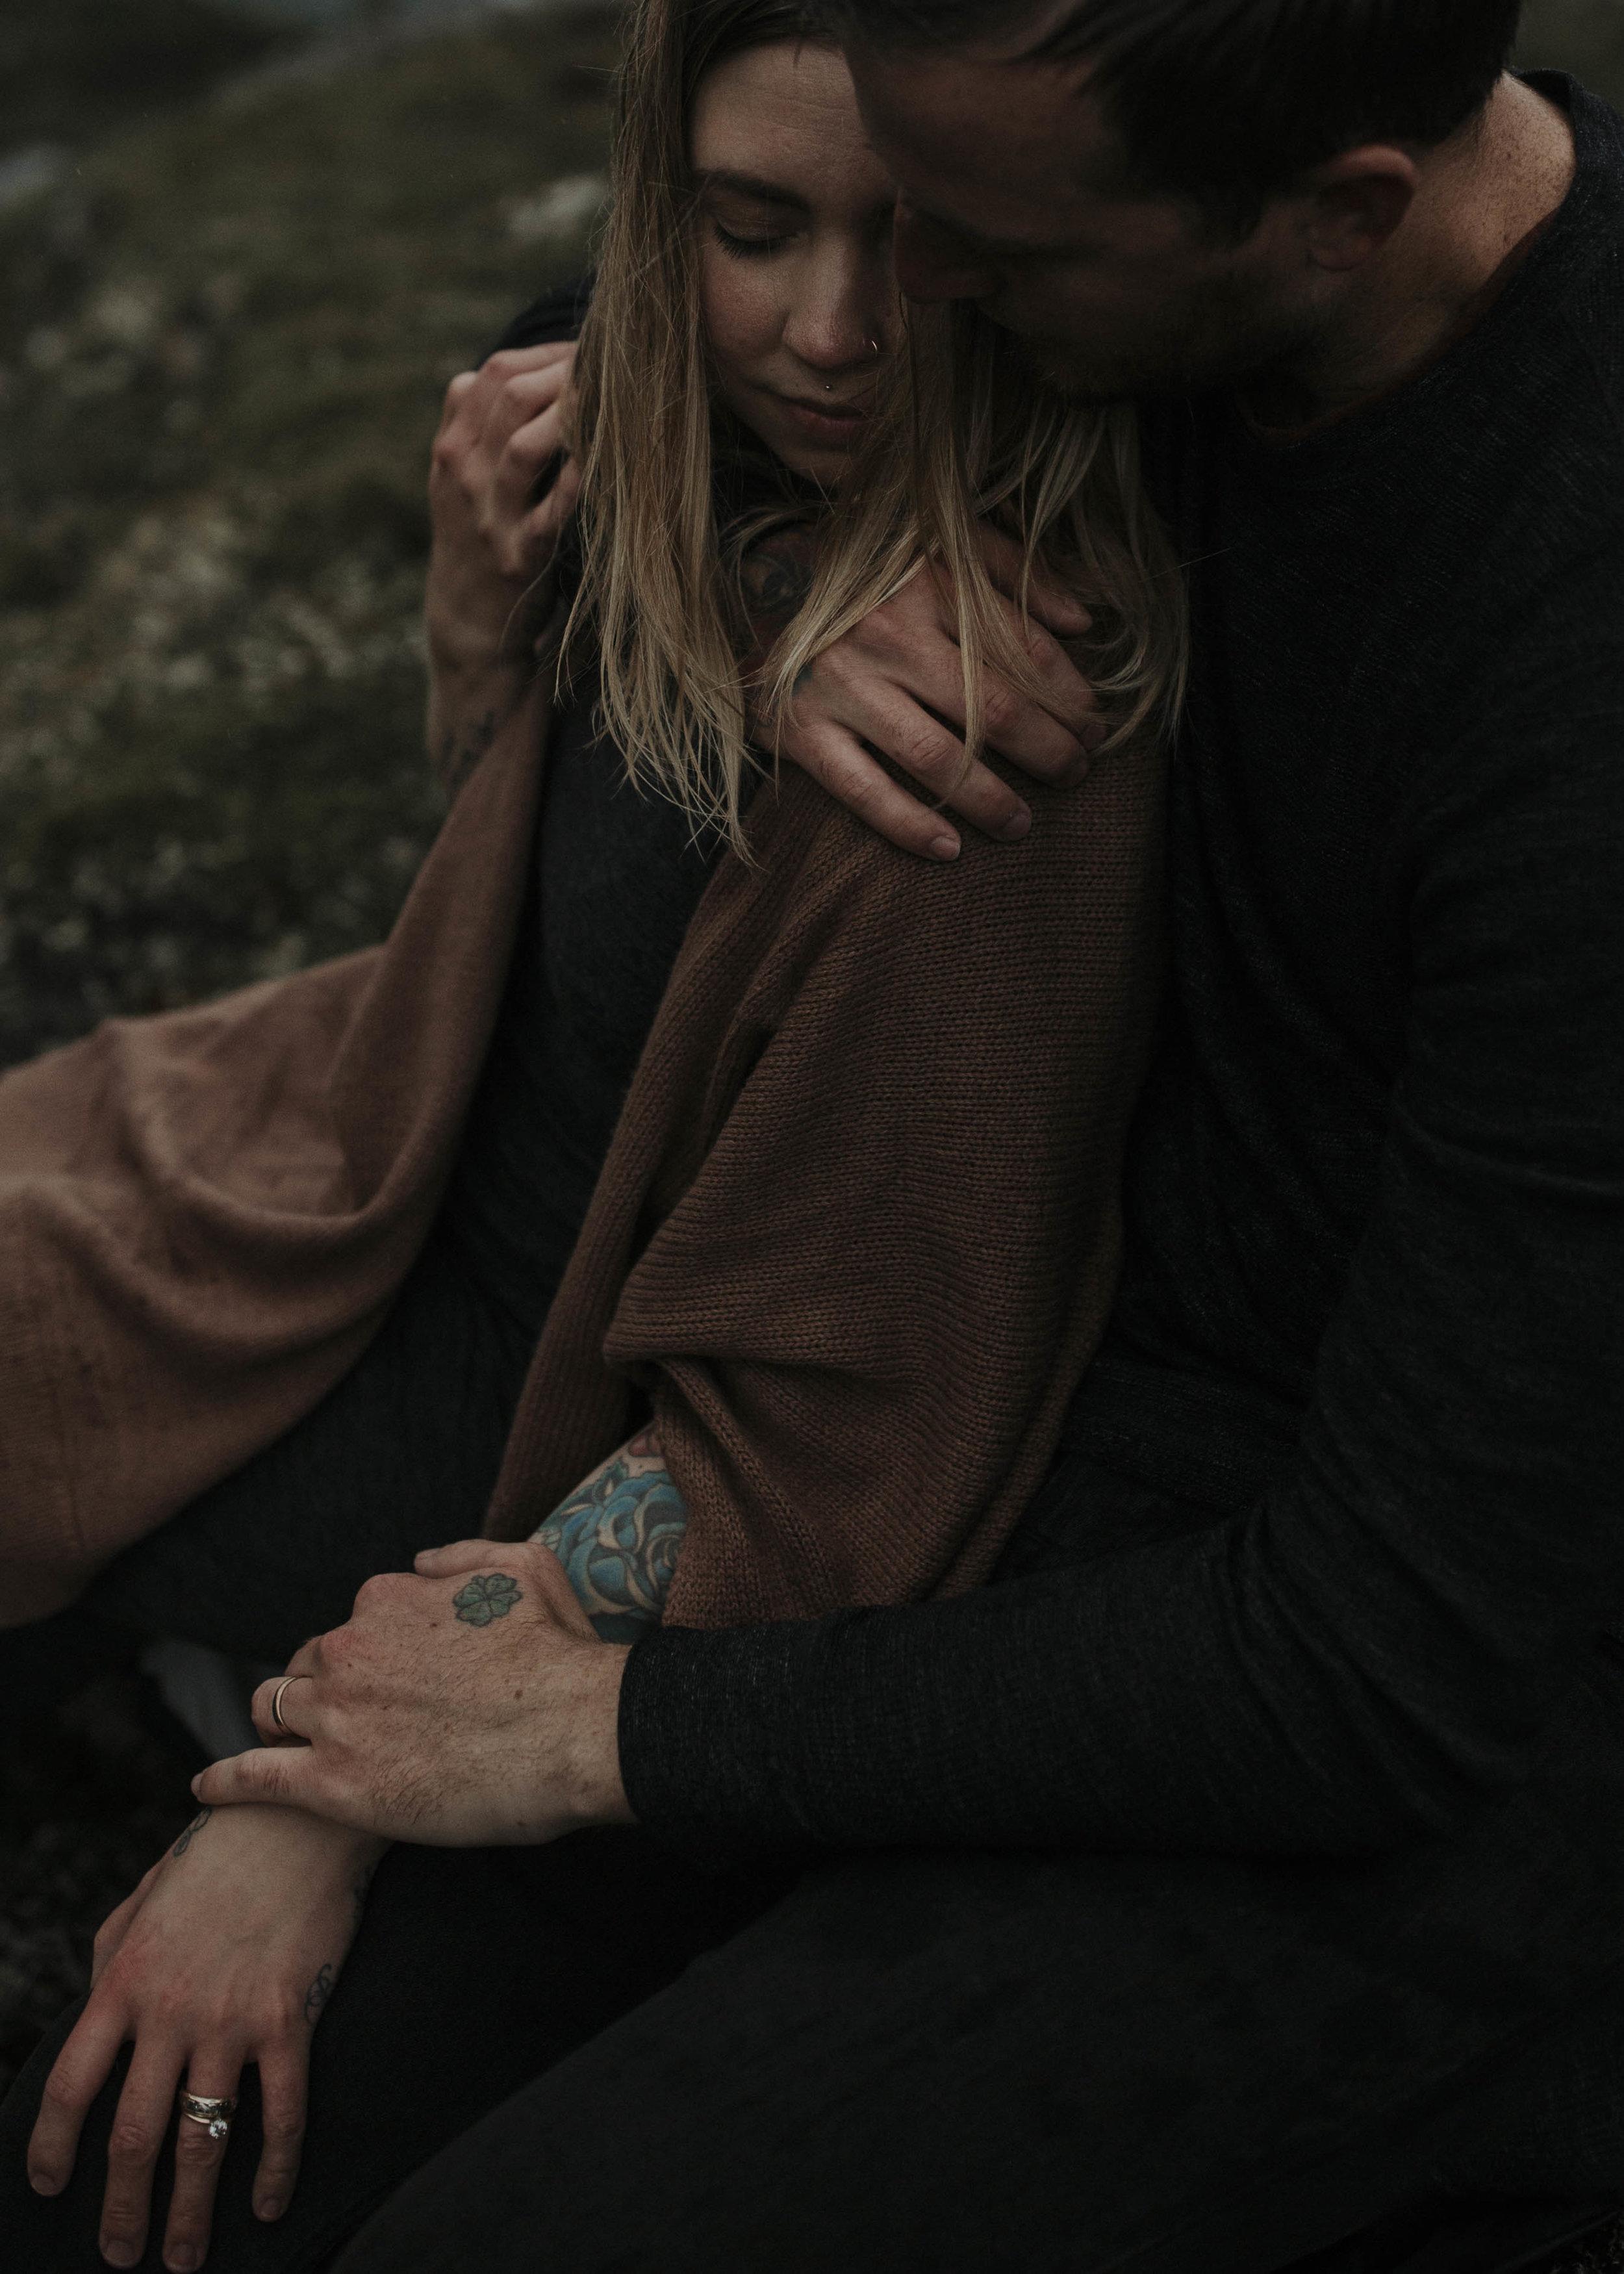 ariel-lynn-alaskan-mountain-couples-session-22.jpg